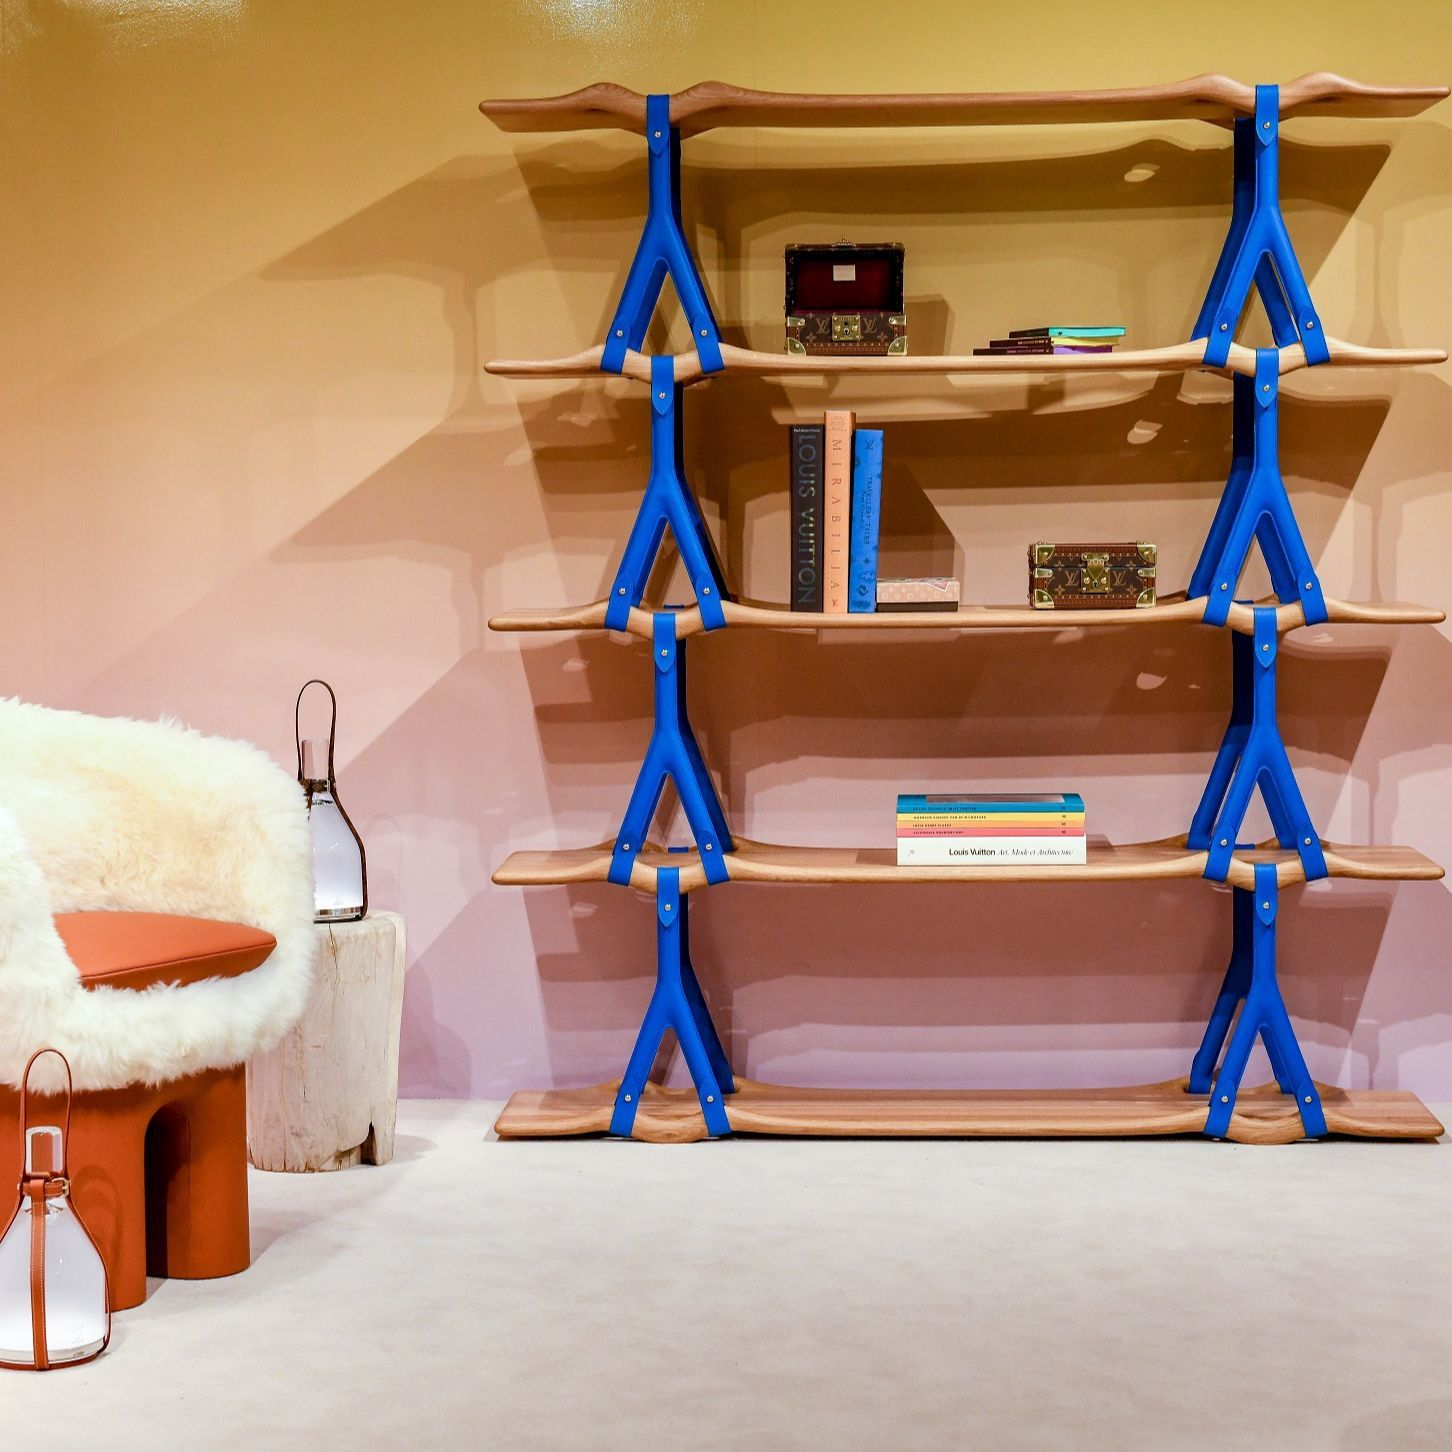 路易威登 2019 呈現美國設計師 Andrew Kudless Objets Nomades 系列作品